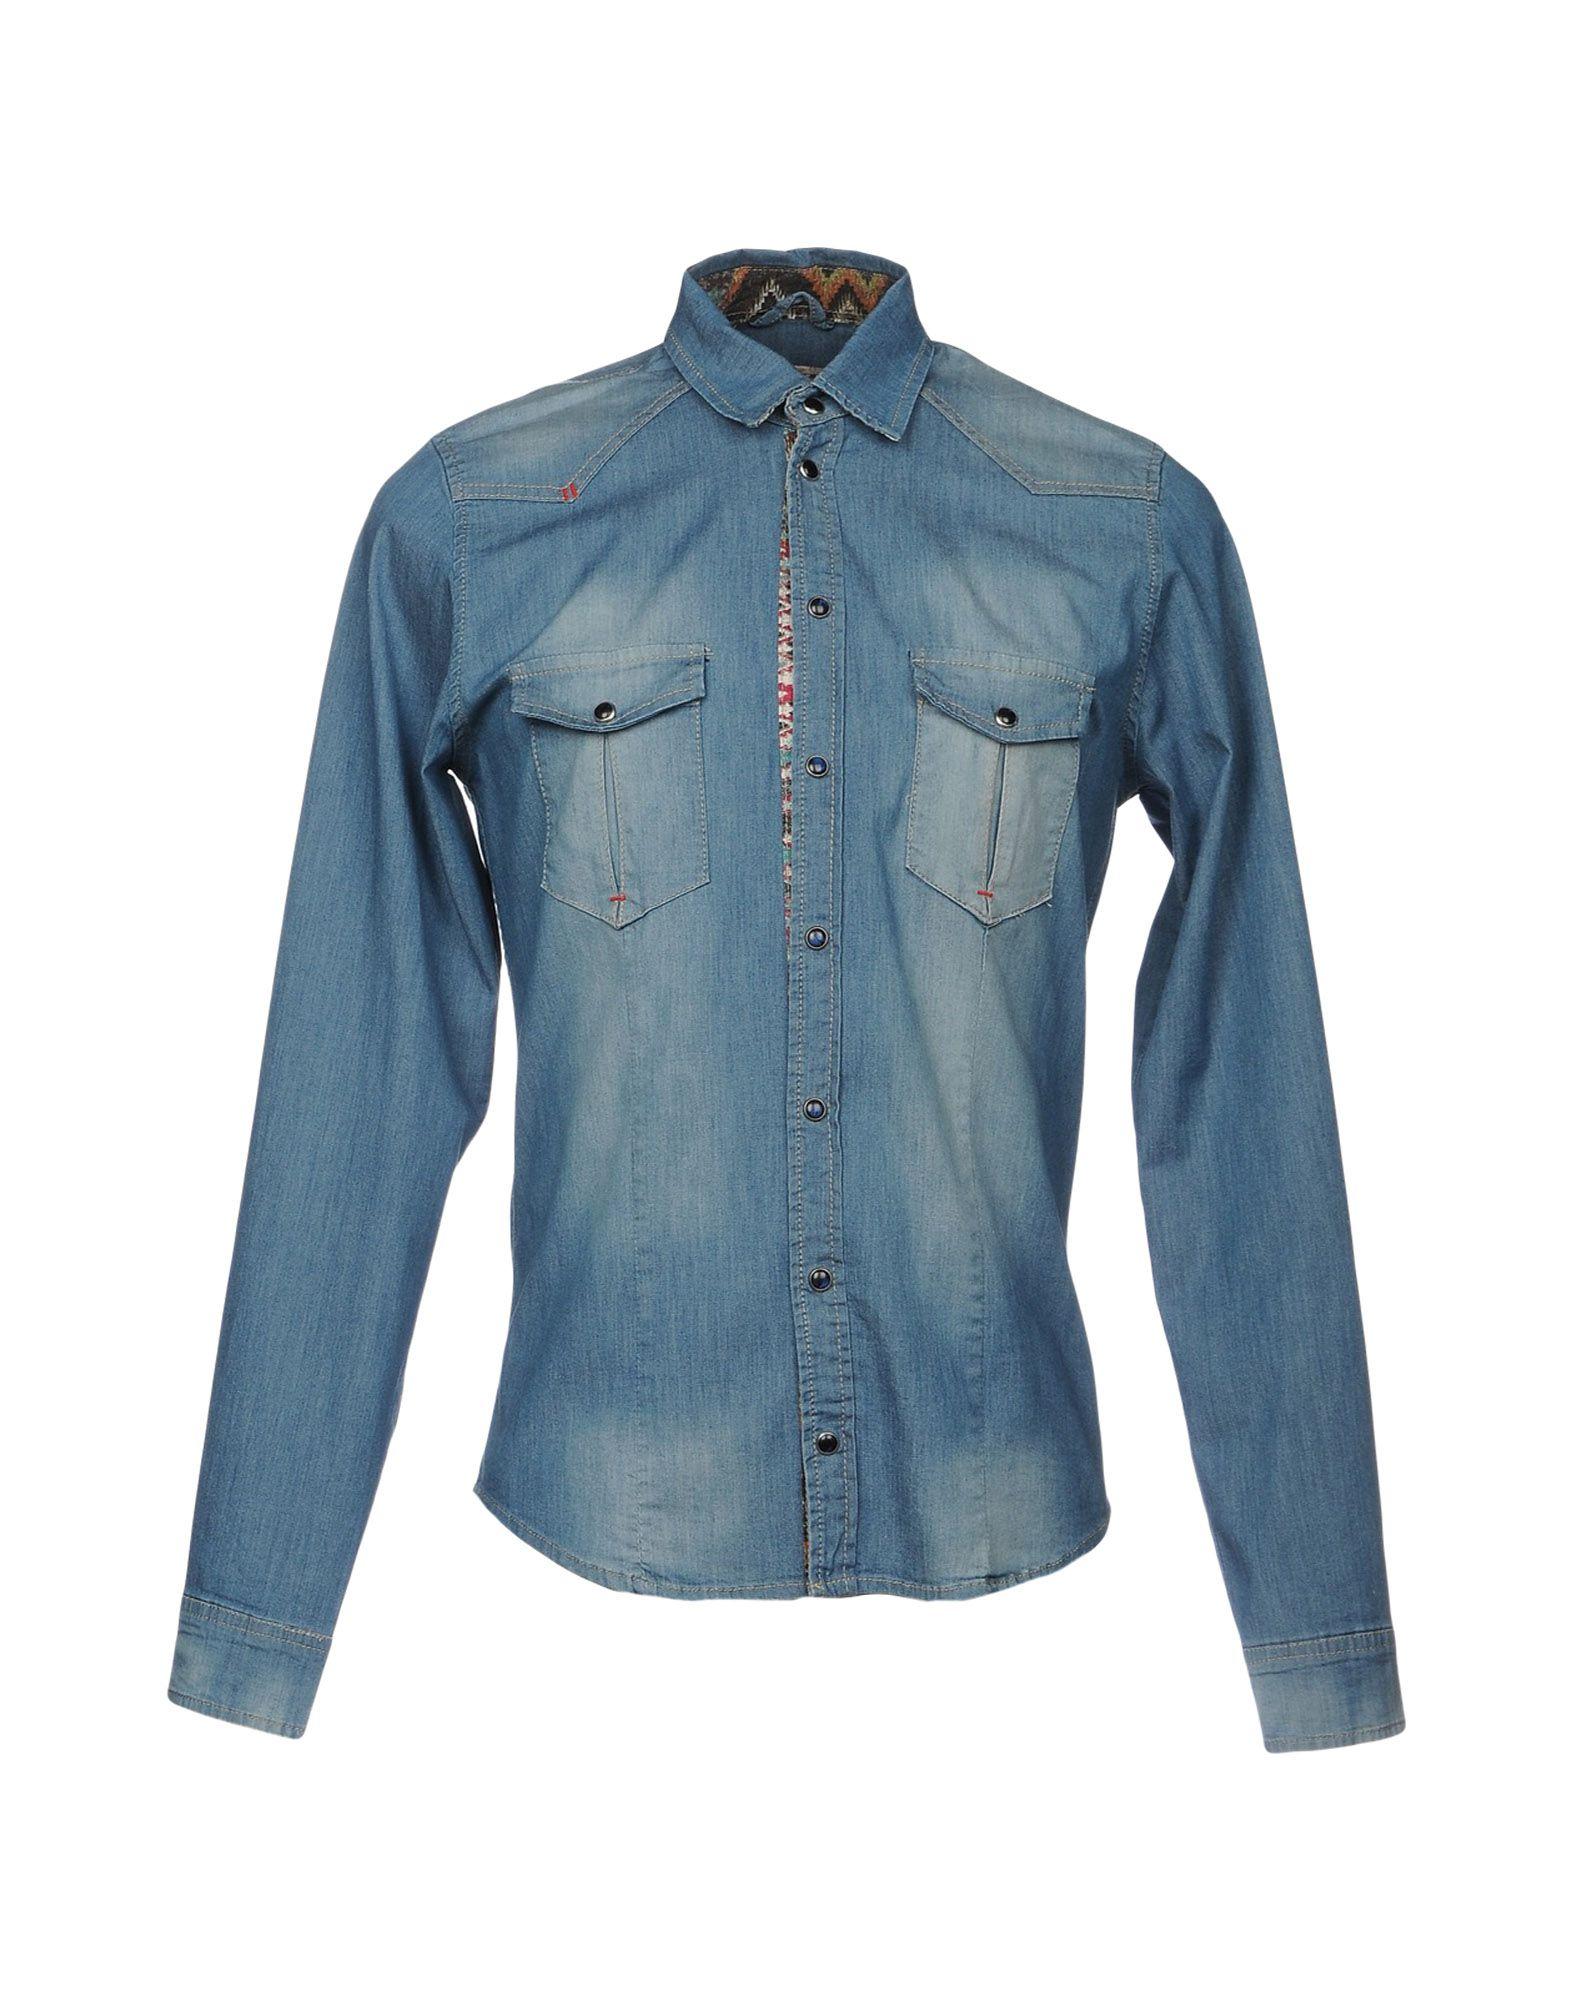 цена X-CAPE Джинсовая рубашка онлайн в 2017 году